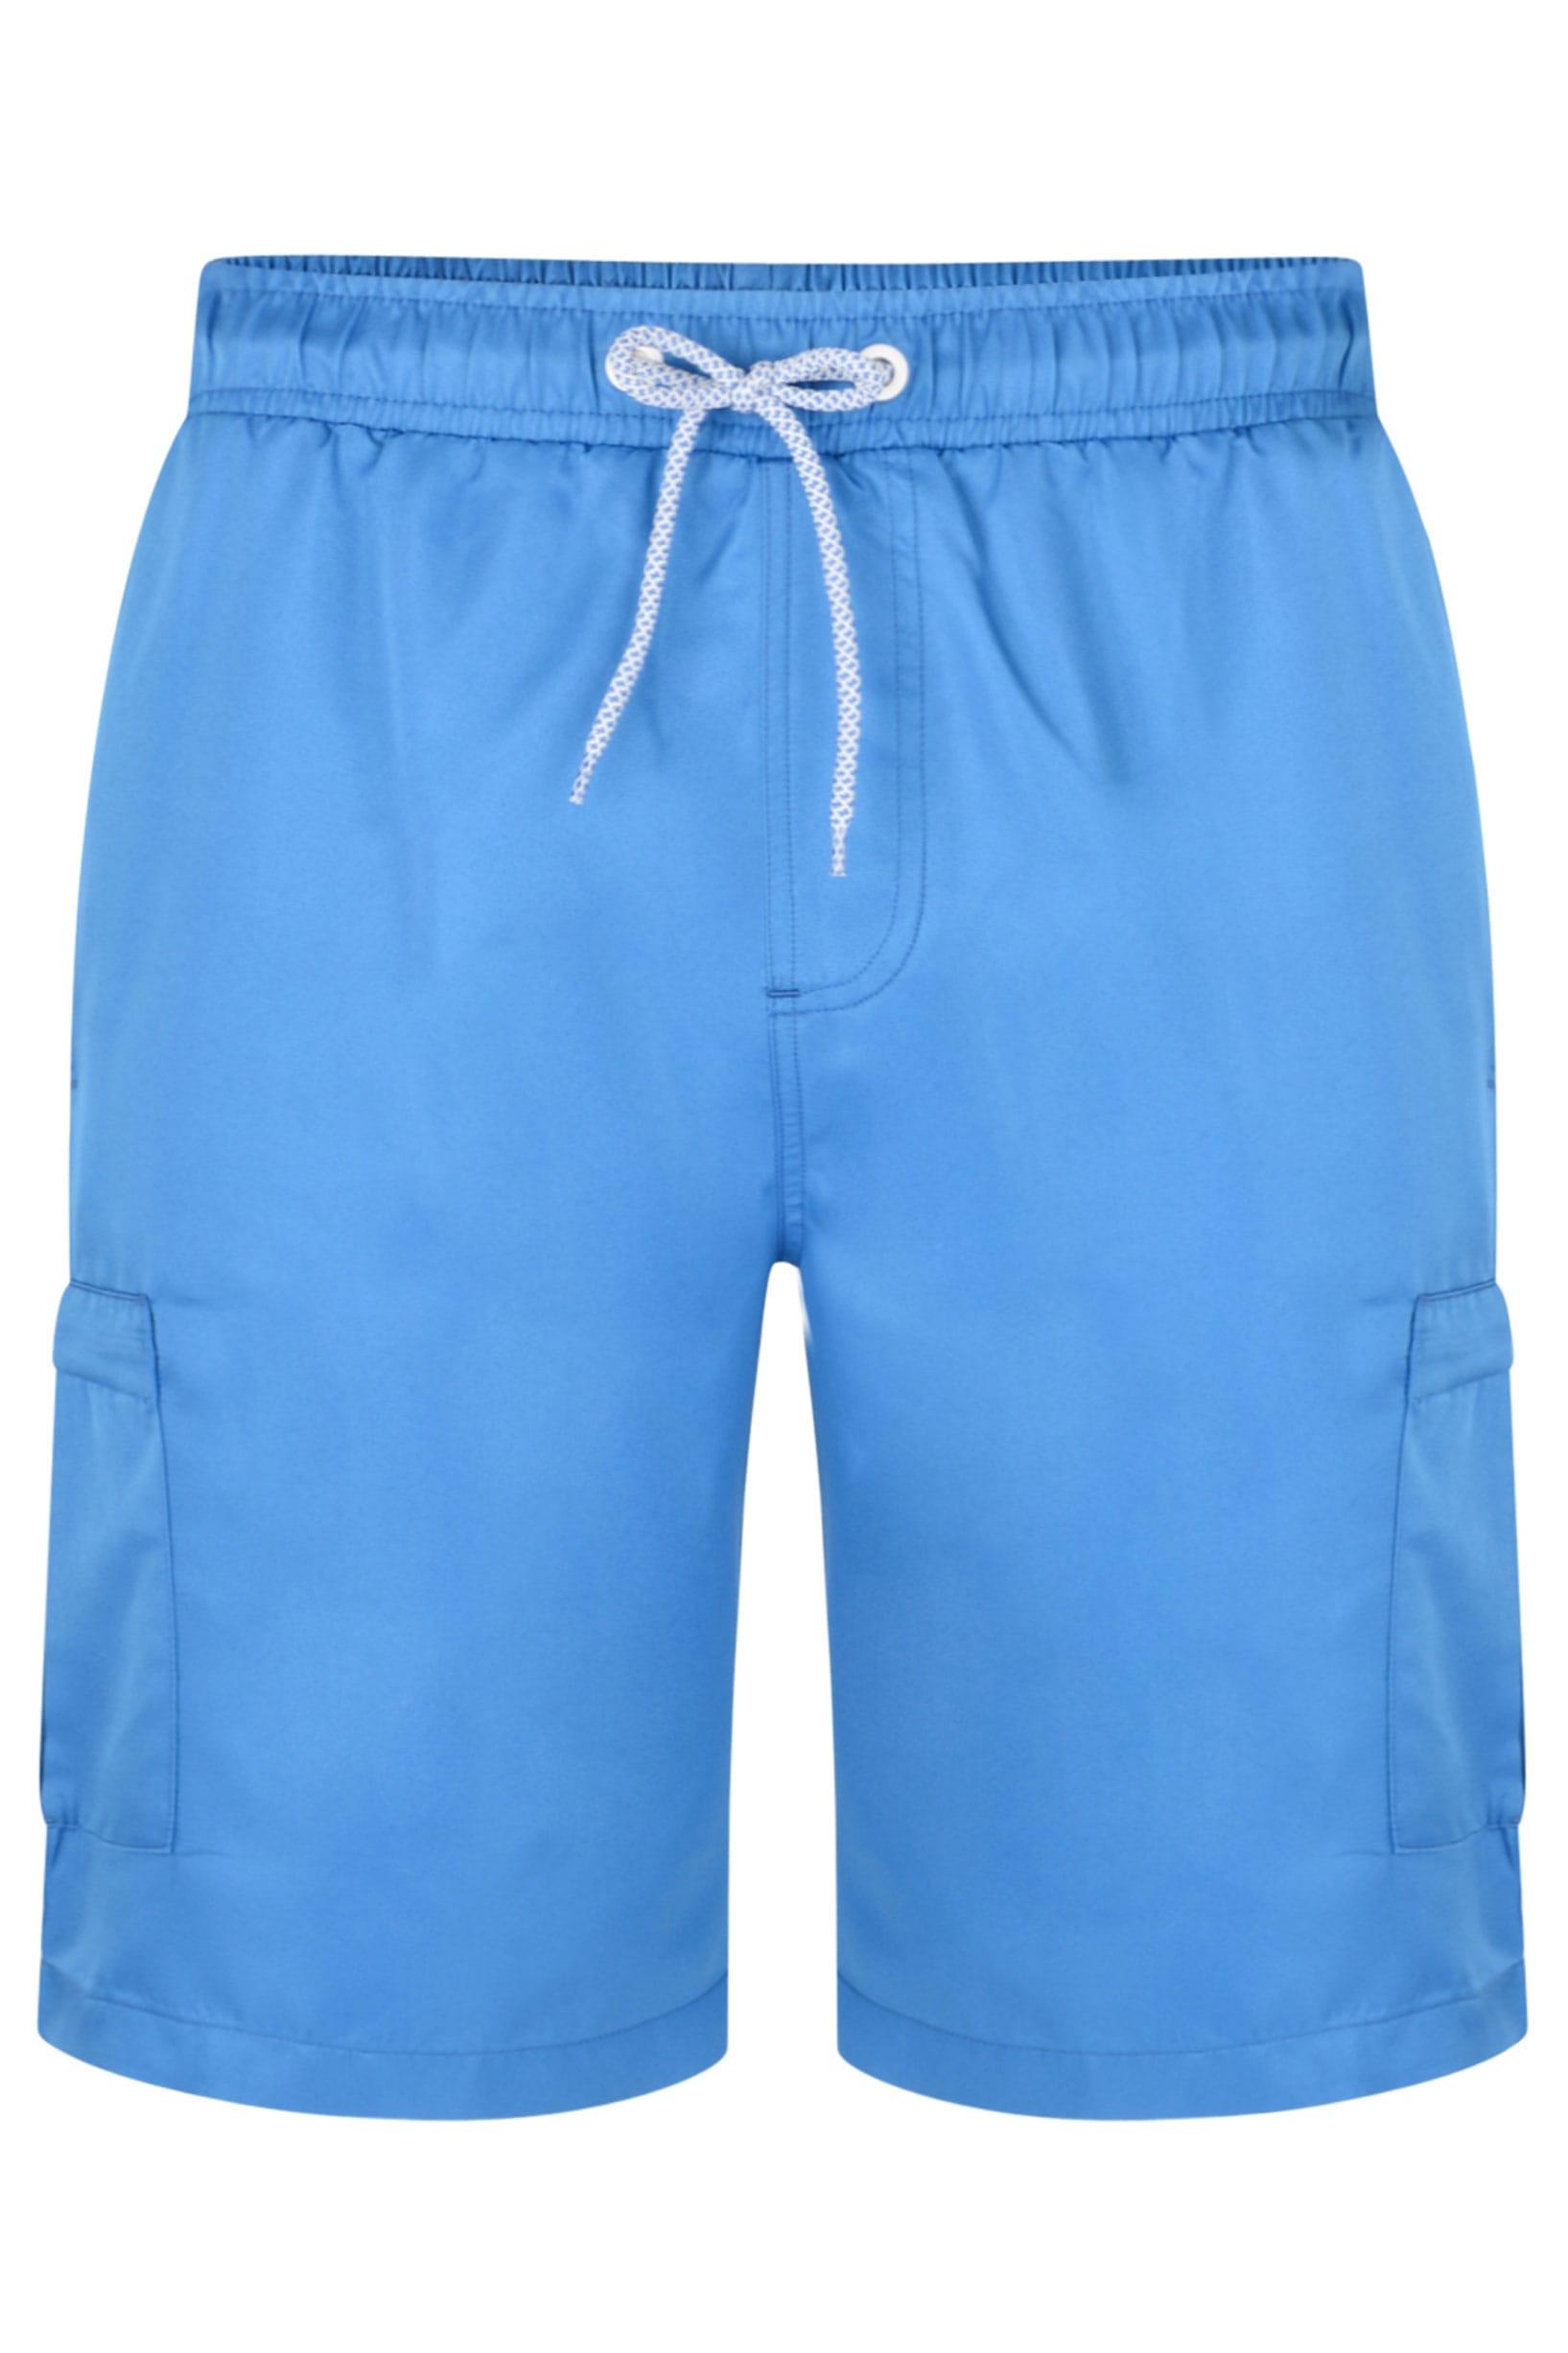 KAM Blue Cargo Swim Shorts